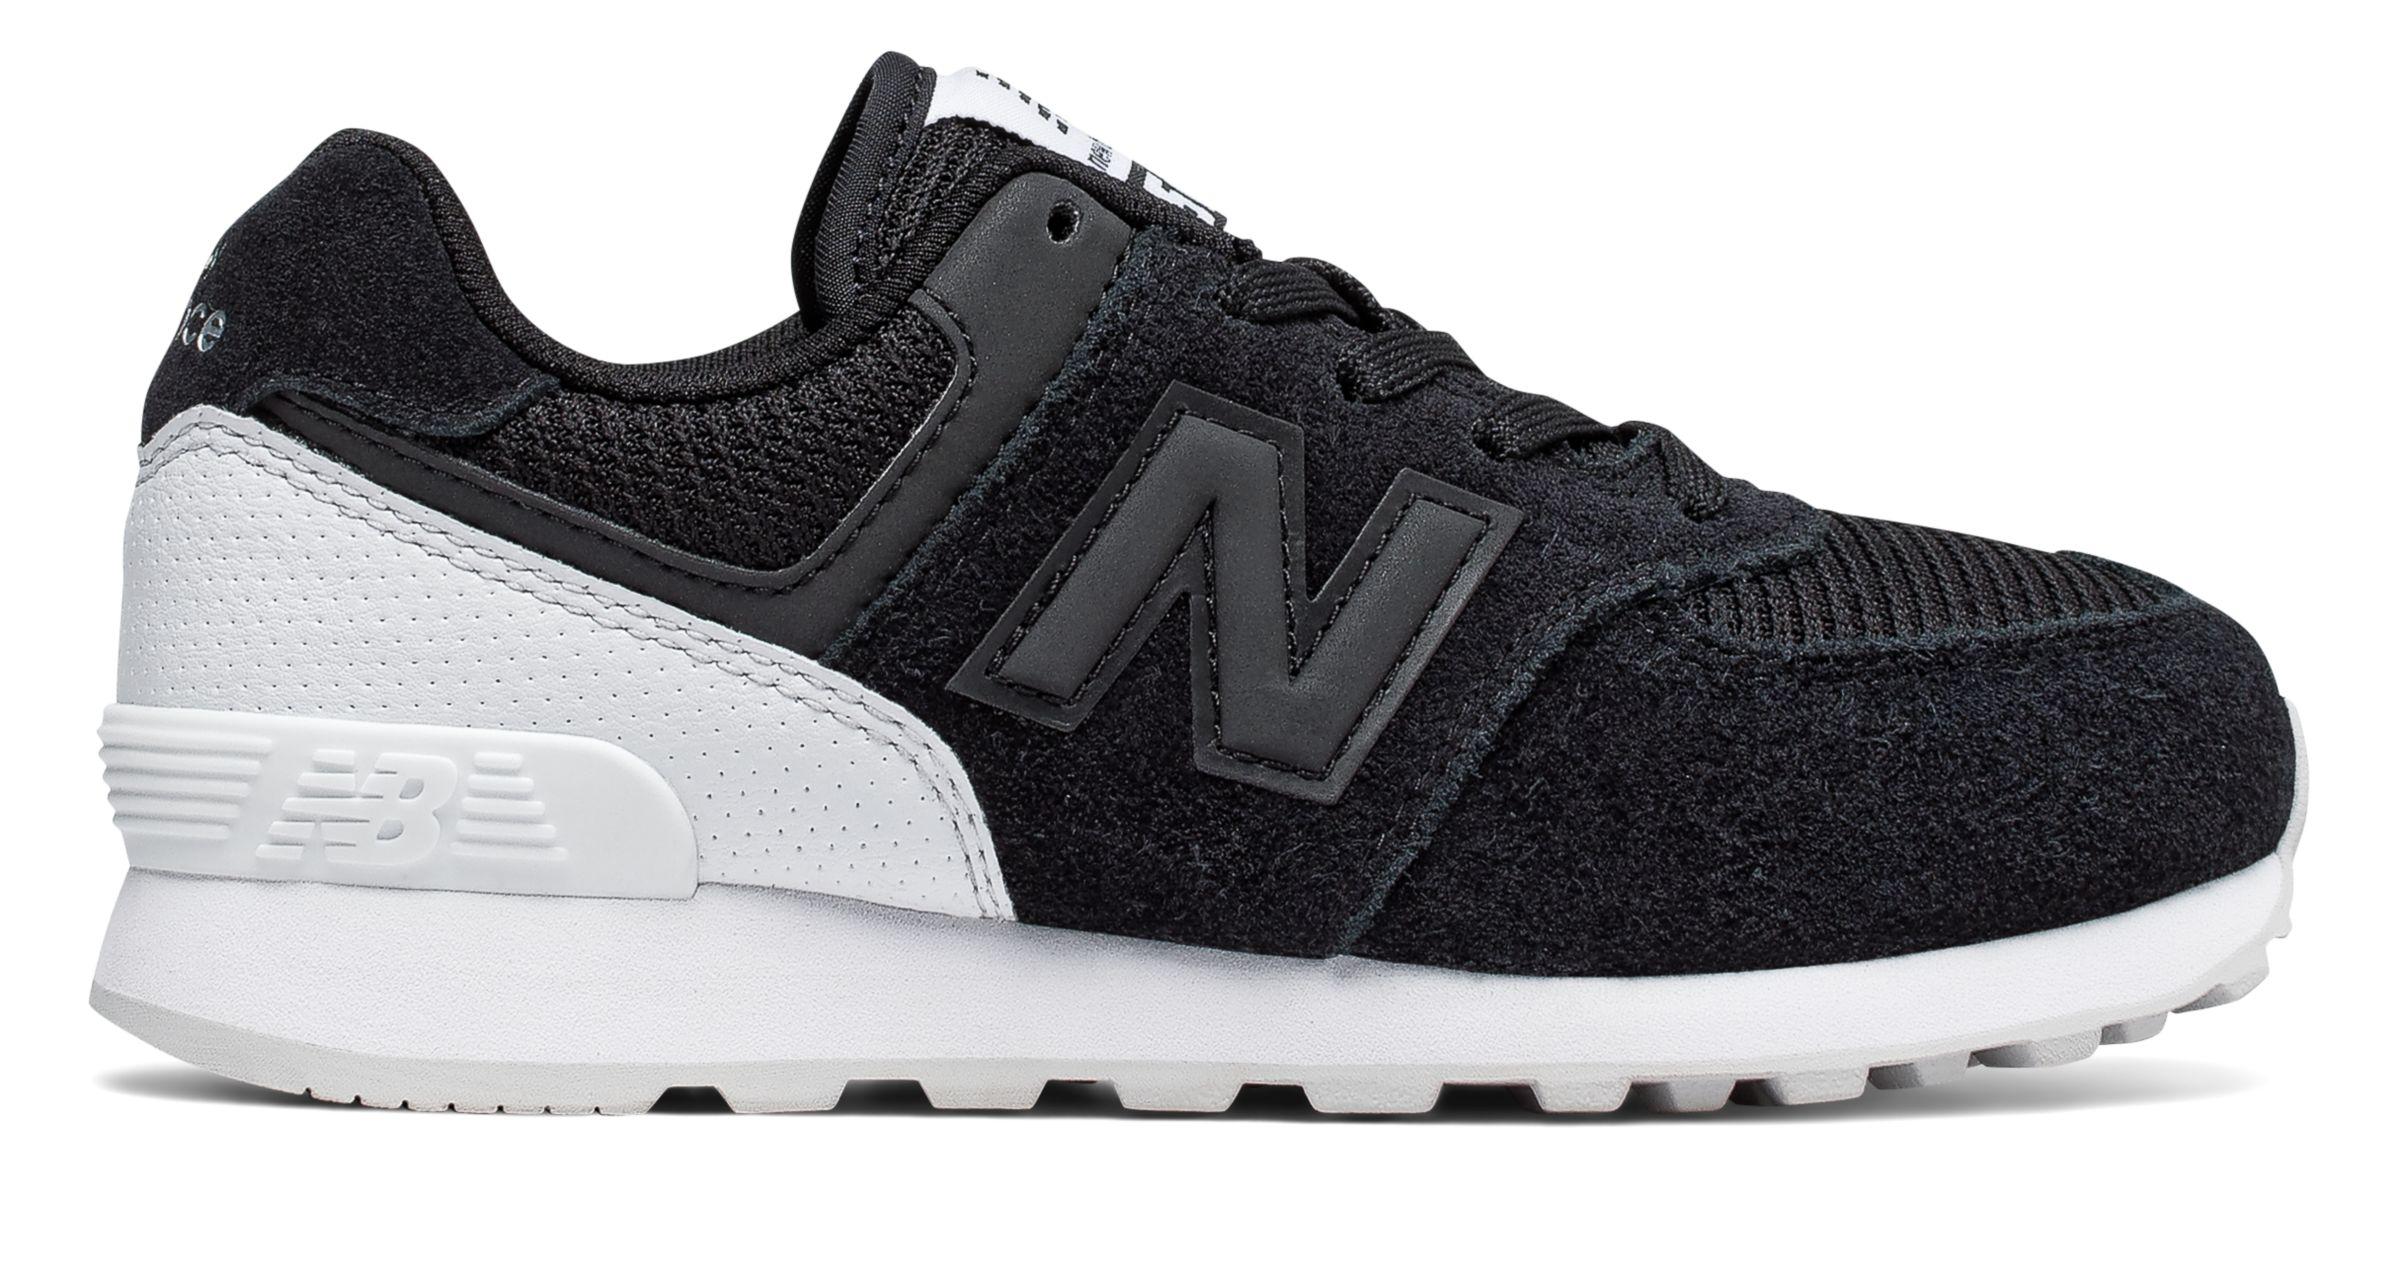 NB 574 New Balance, Black with White